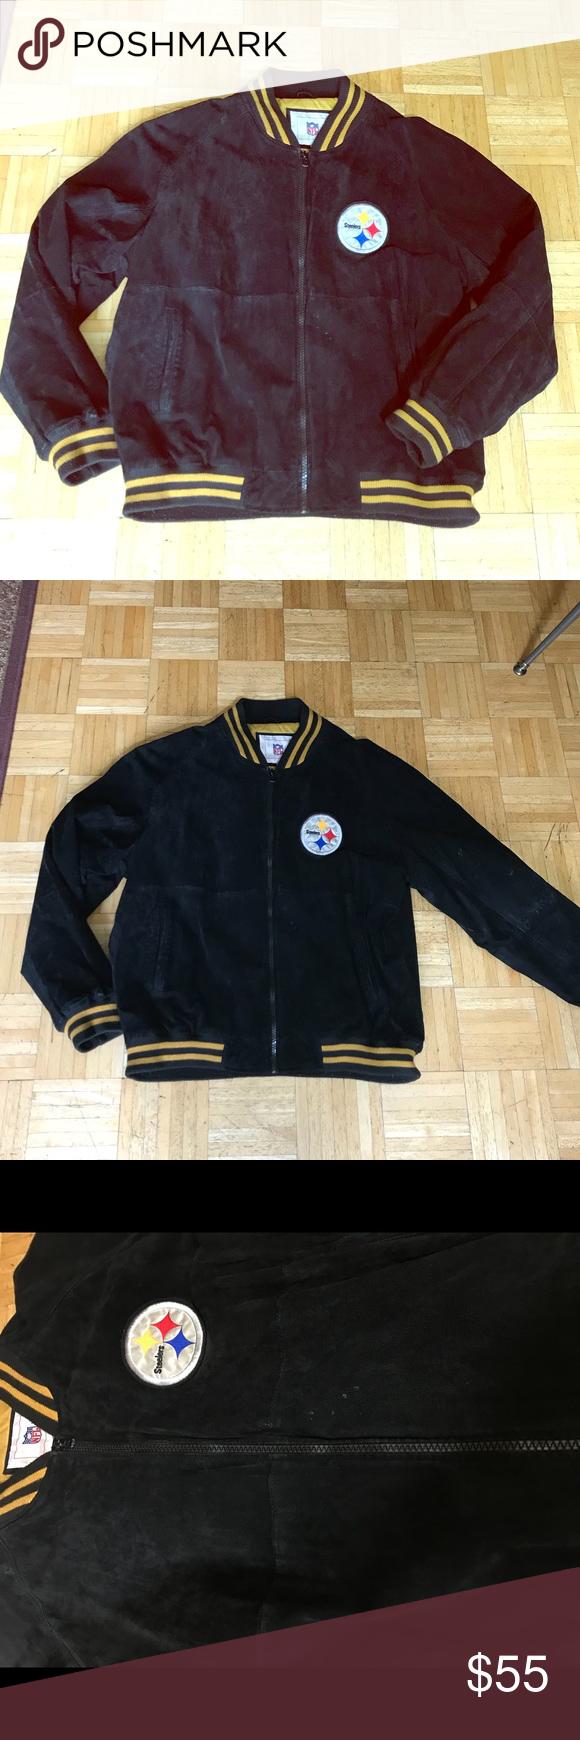 VINTAGE Steelers Leather Bomber Jacket Vintage Pittsburgh